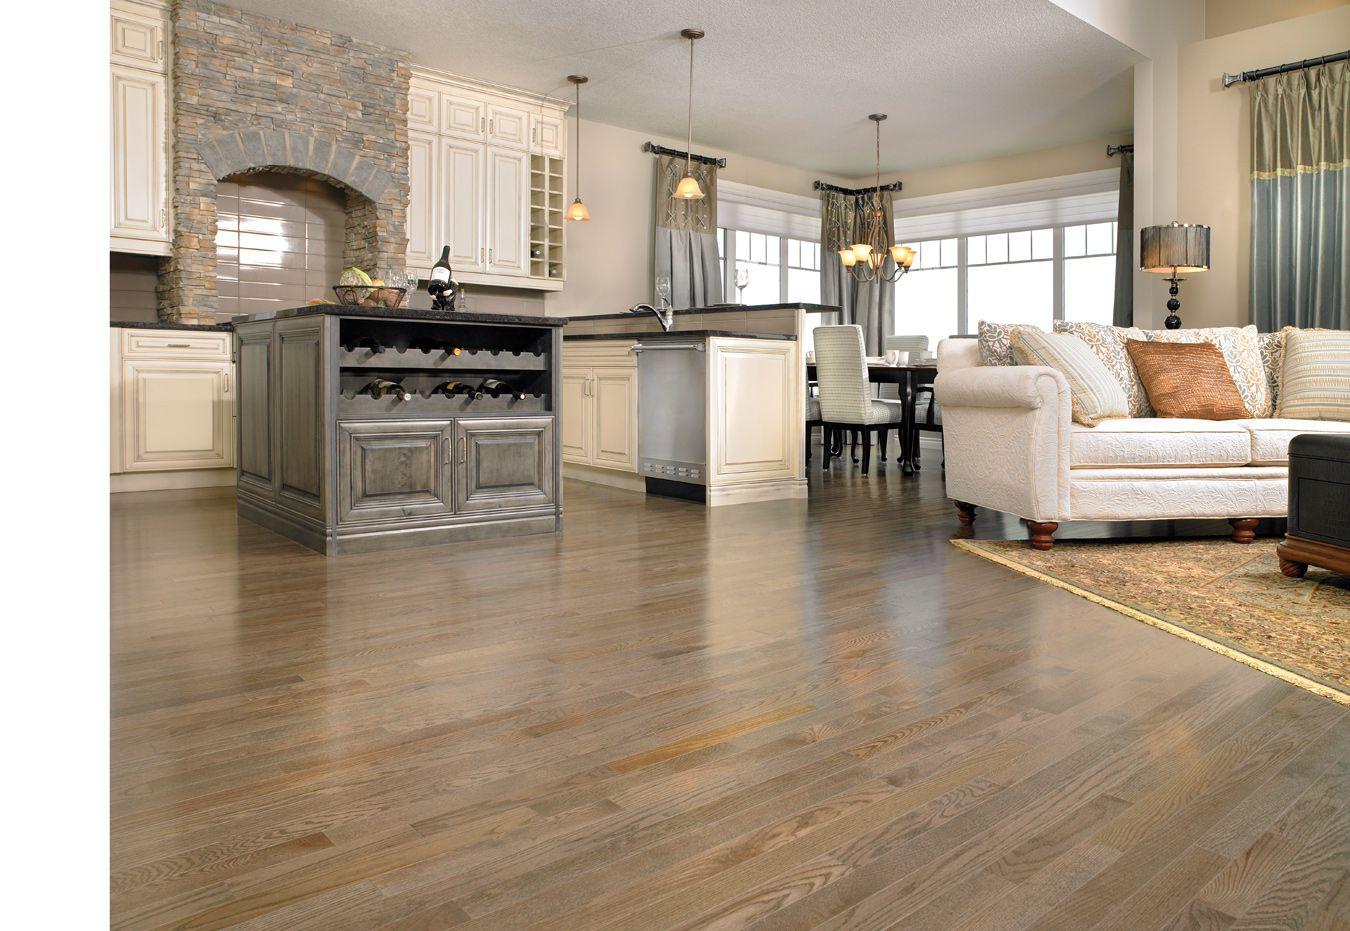 123 Best Mirage Hardwood Floors Images On Pinterest | Hardwood Floors,  Sweet Memories And White Oak